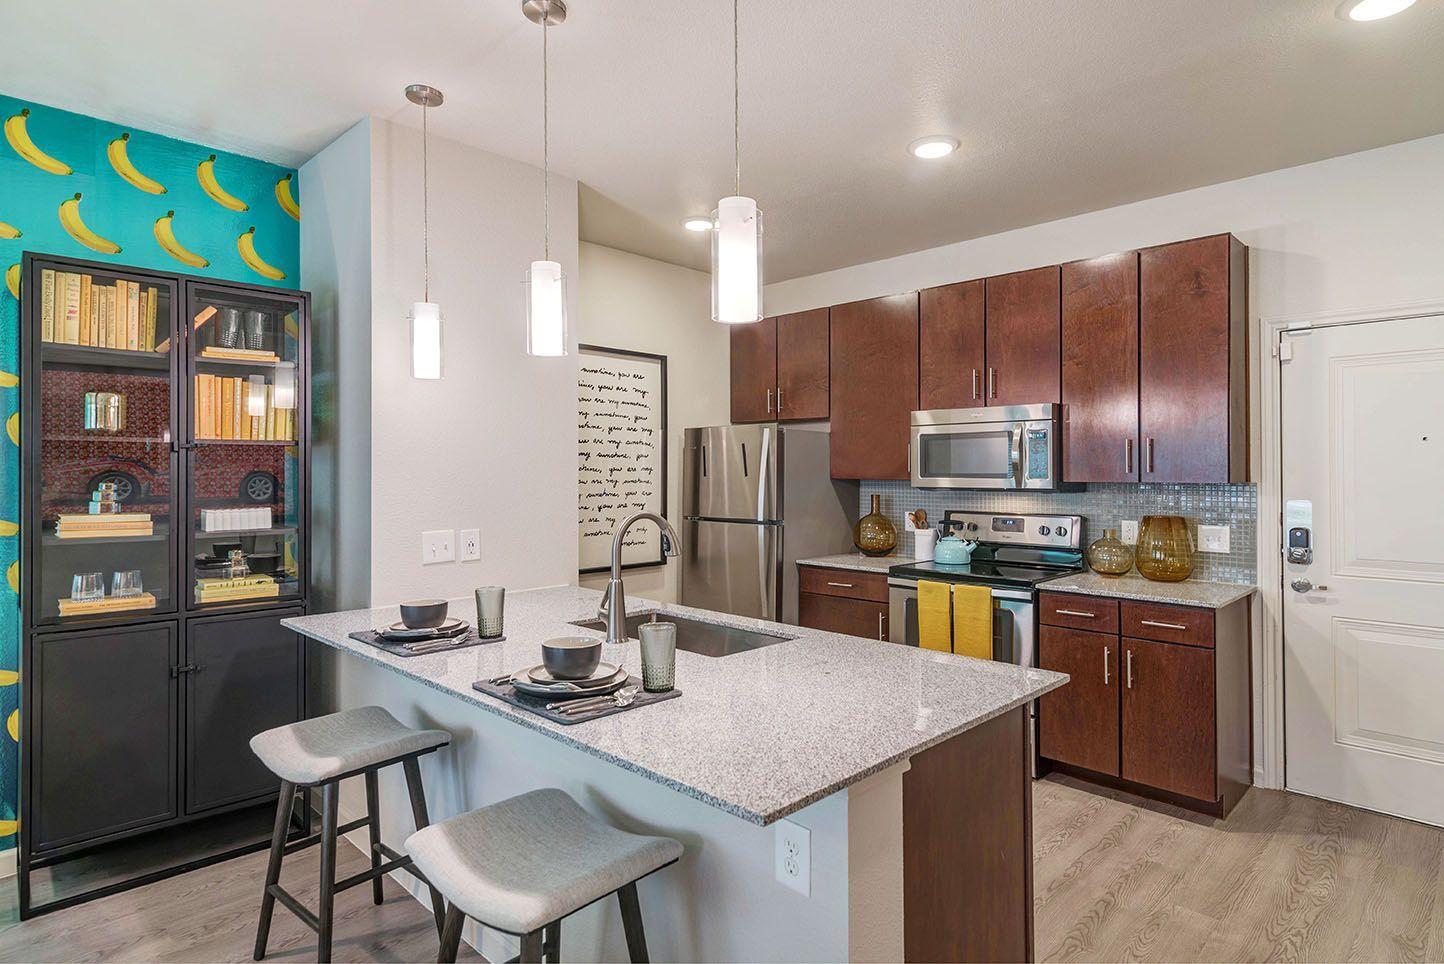 Apartments Near UT Austin Cortland Onion Creek for University of Texas - Austin Students in Austin, TX